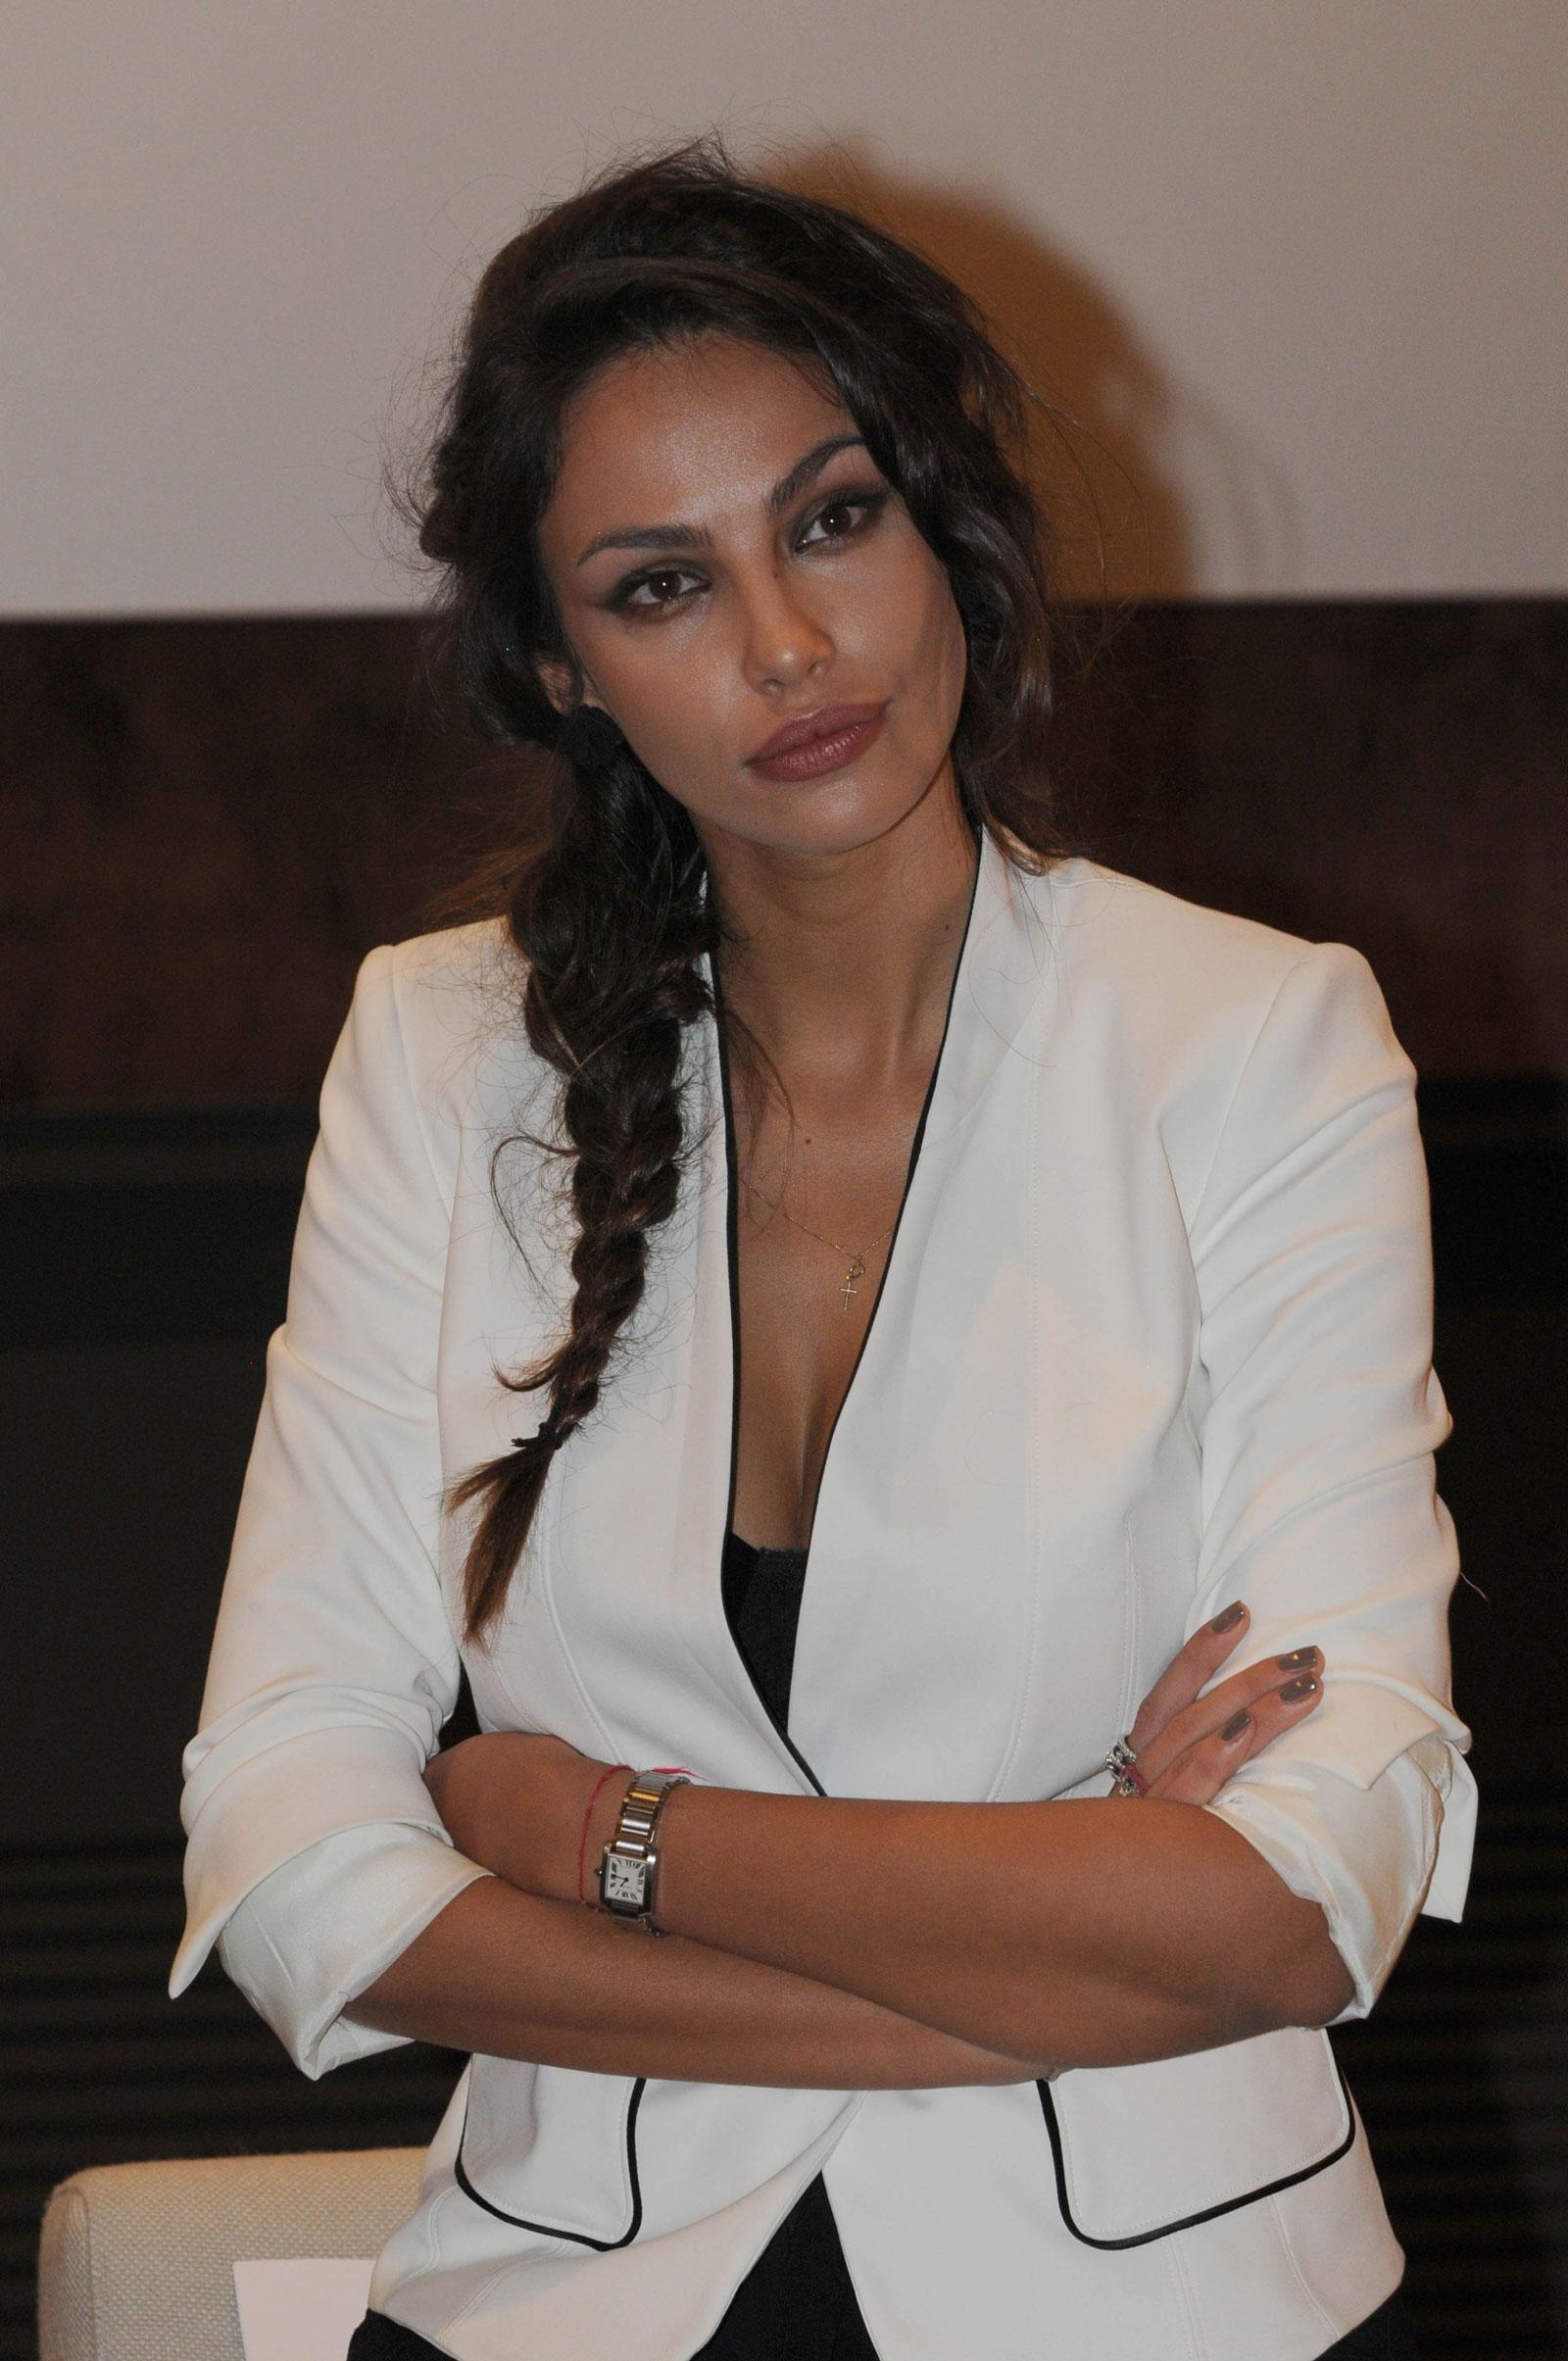 madalina ghenea wiki - photo #29